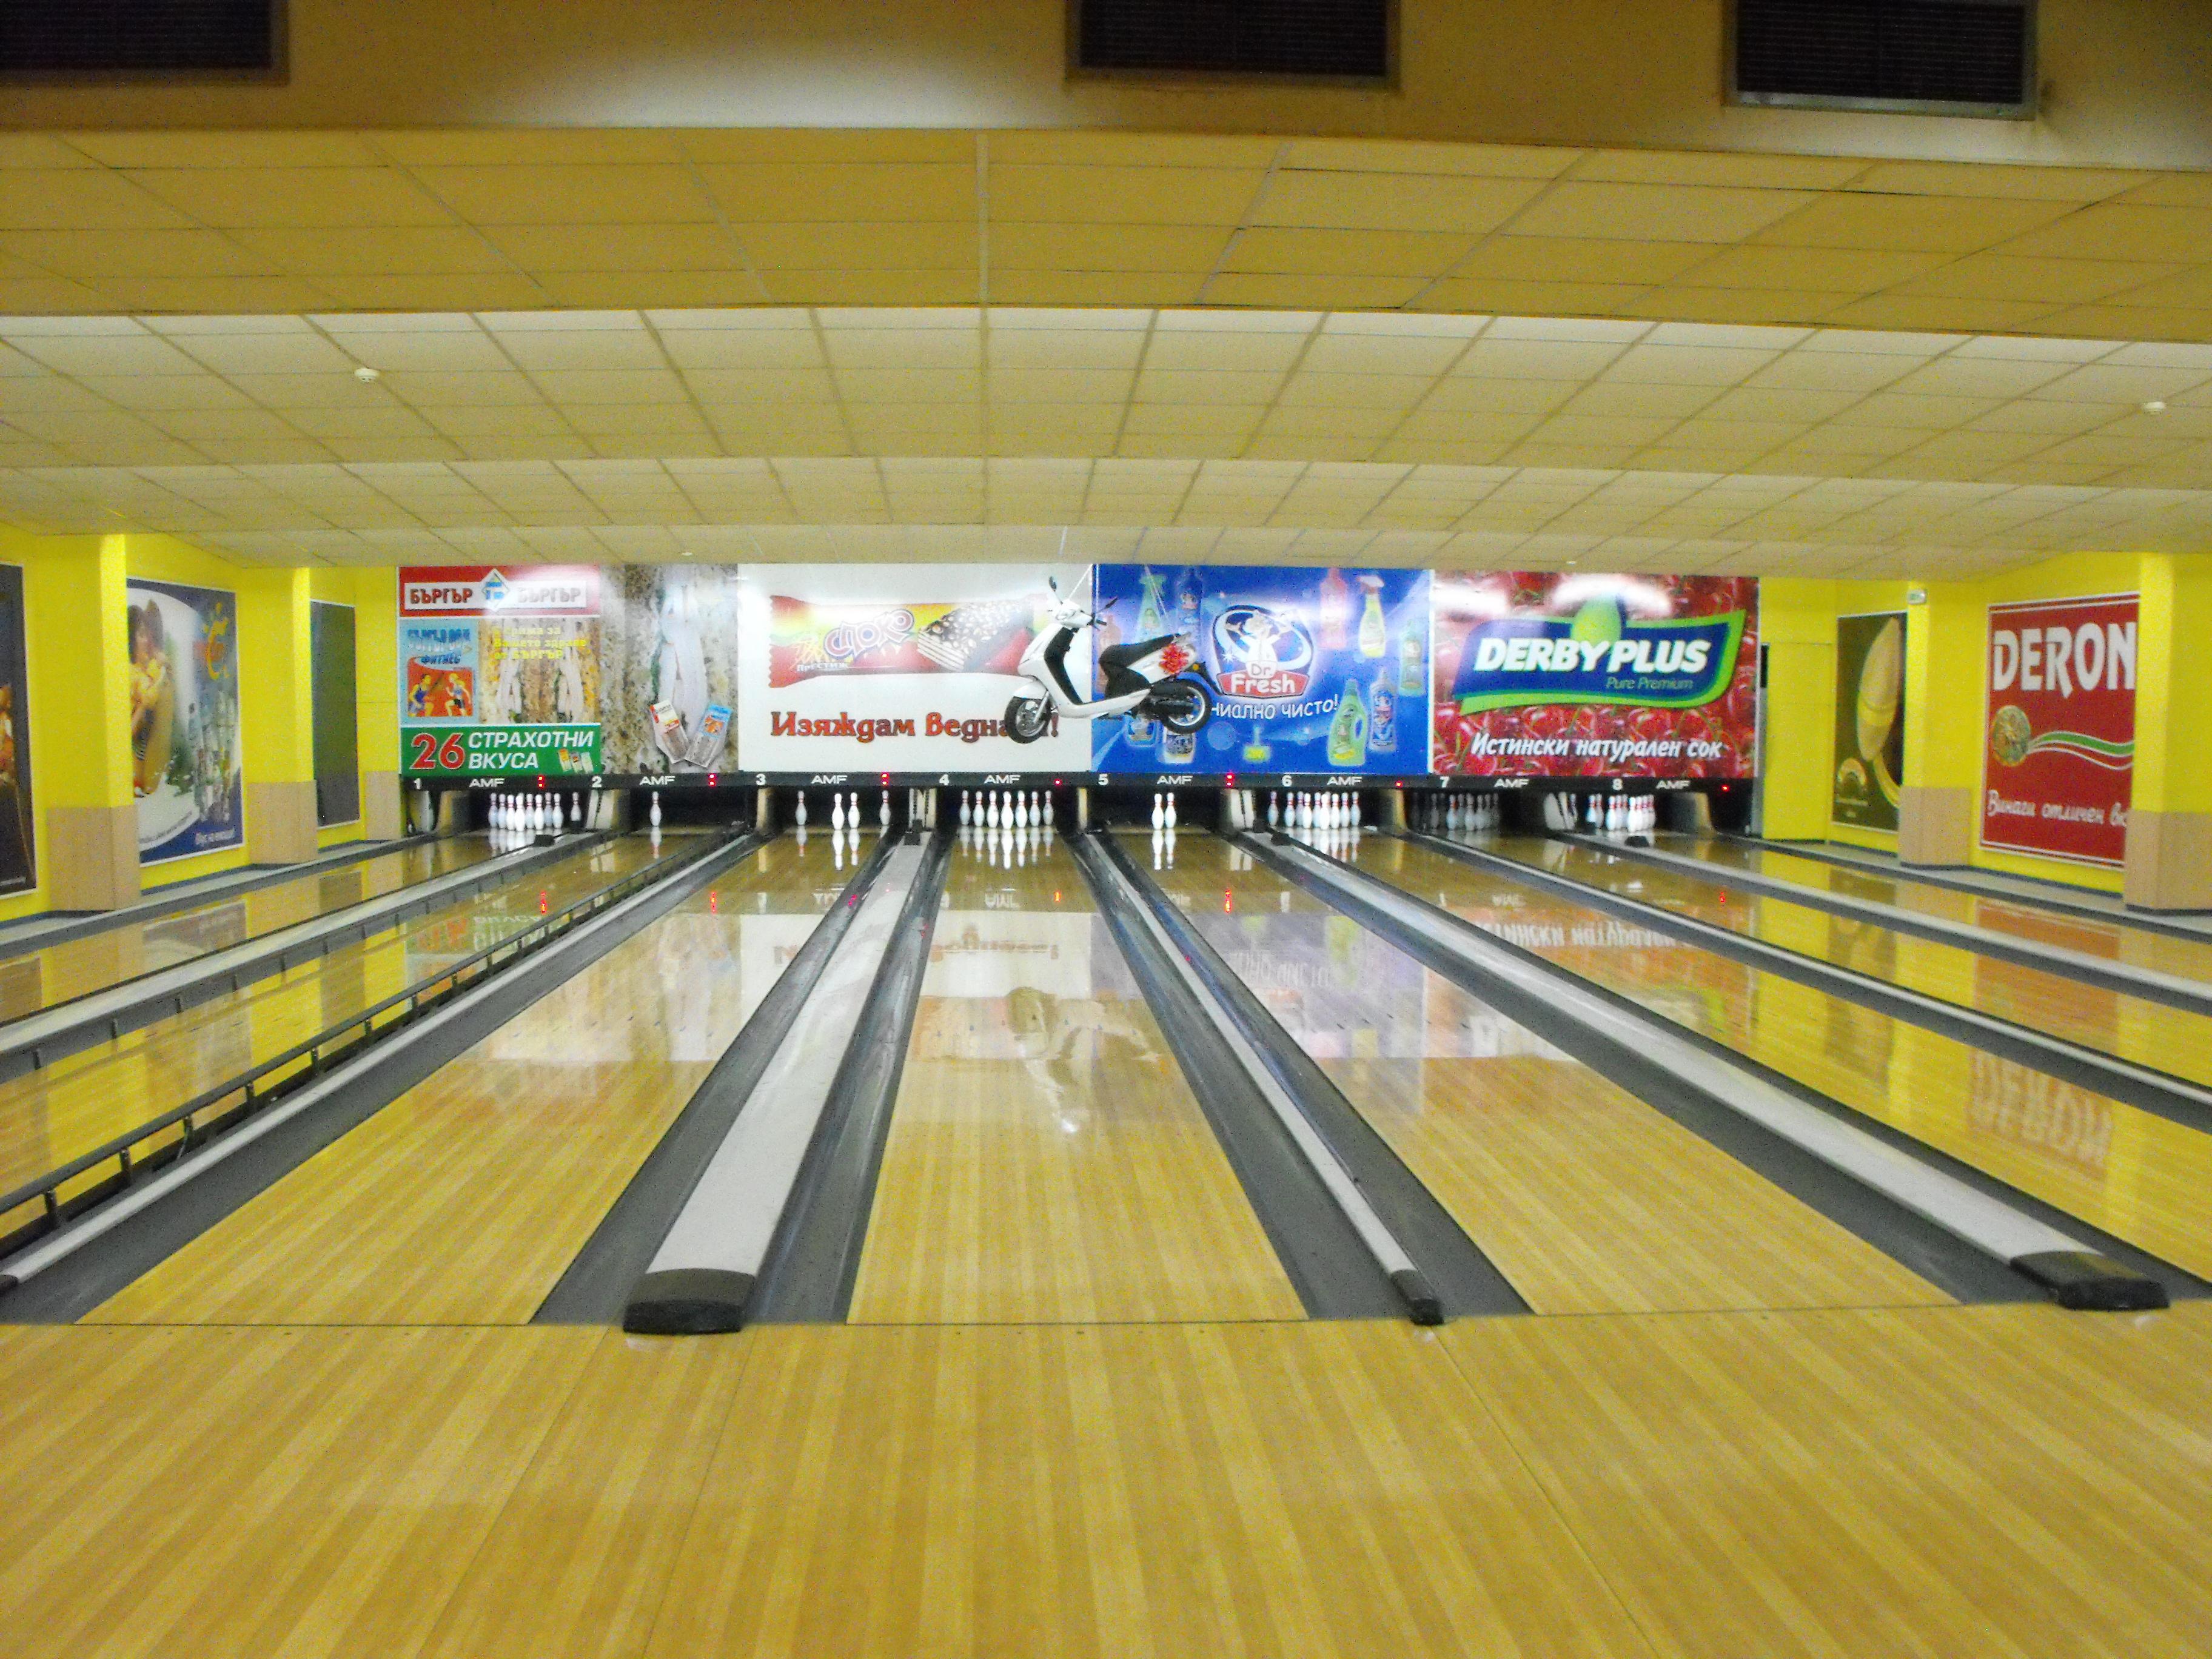 Bowling alley - Wikipedia